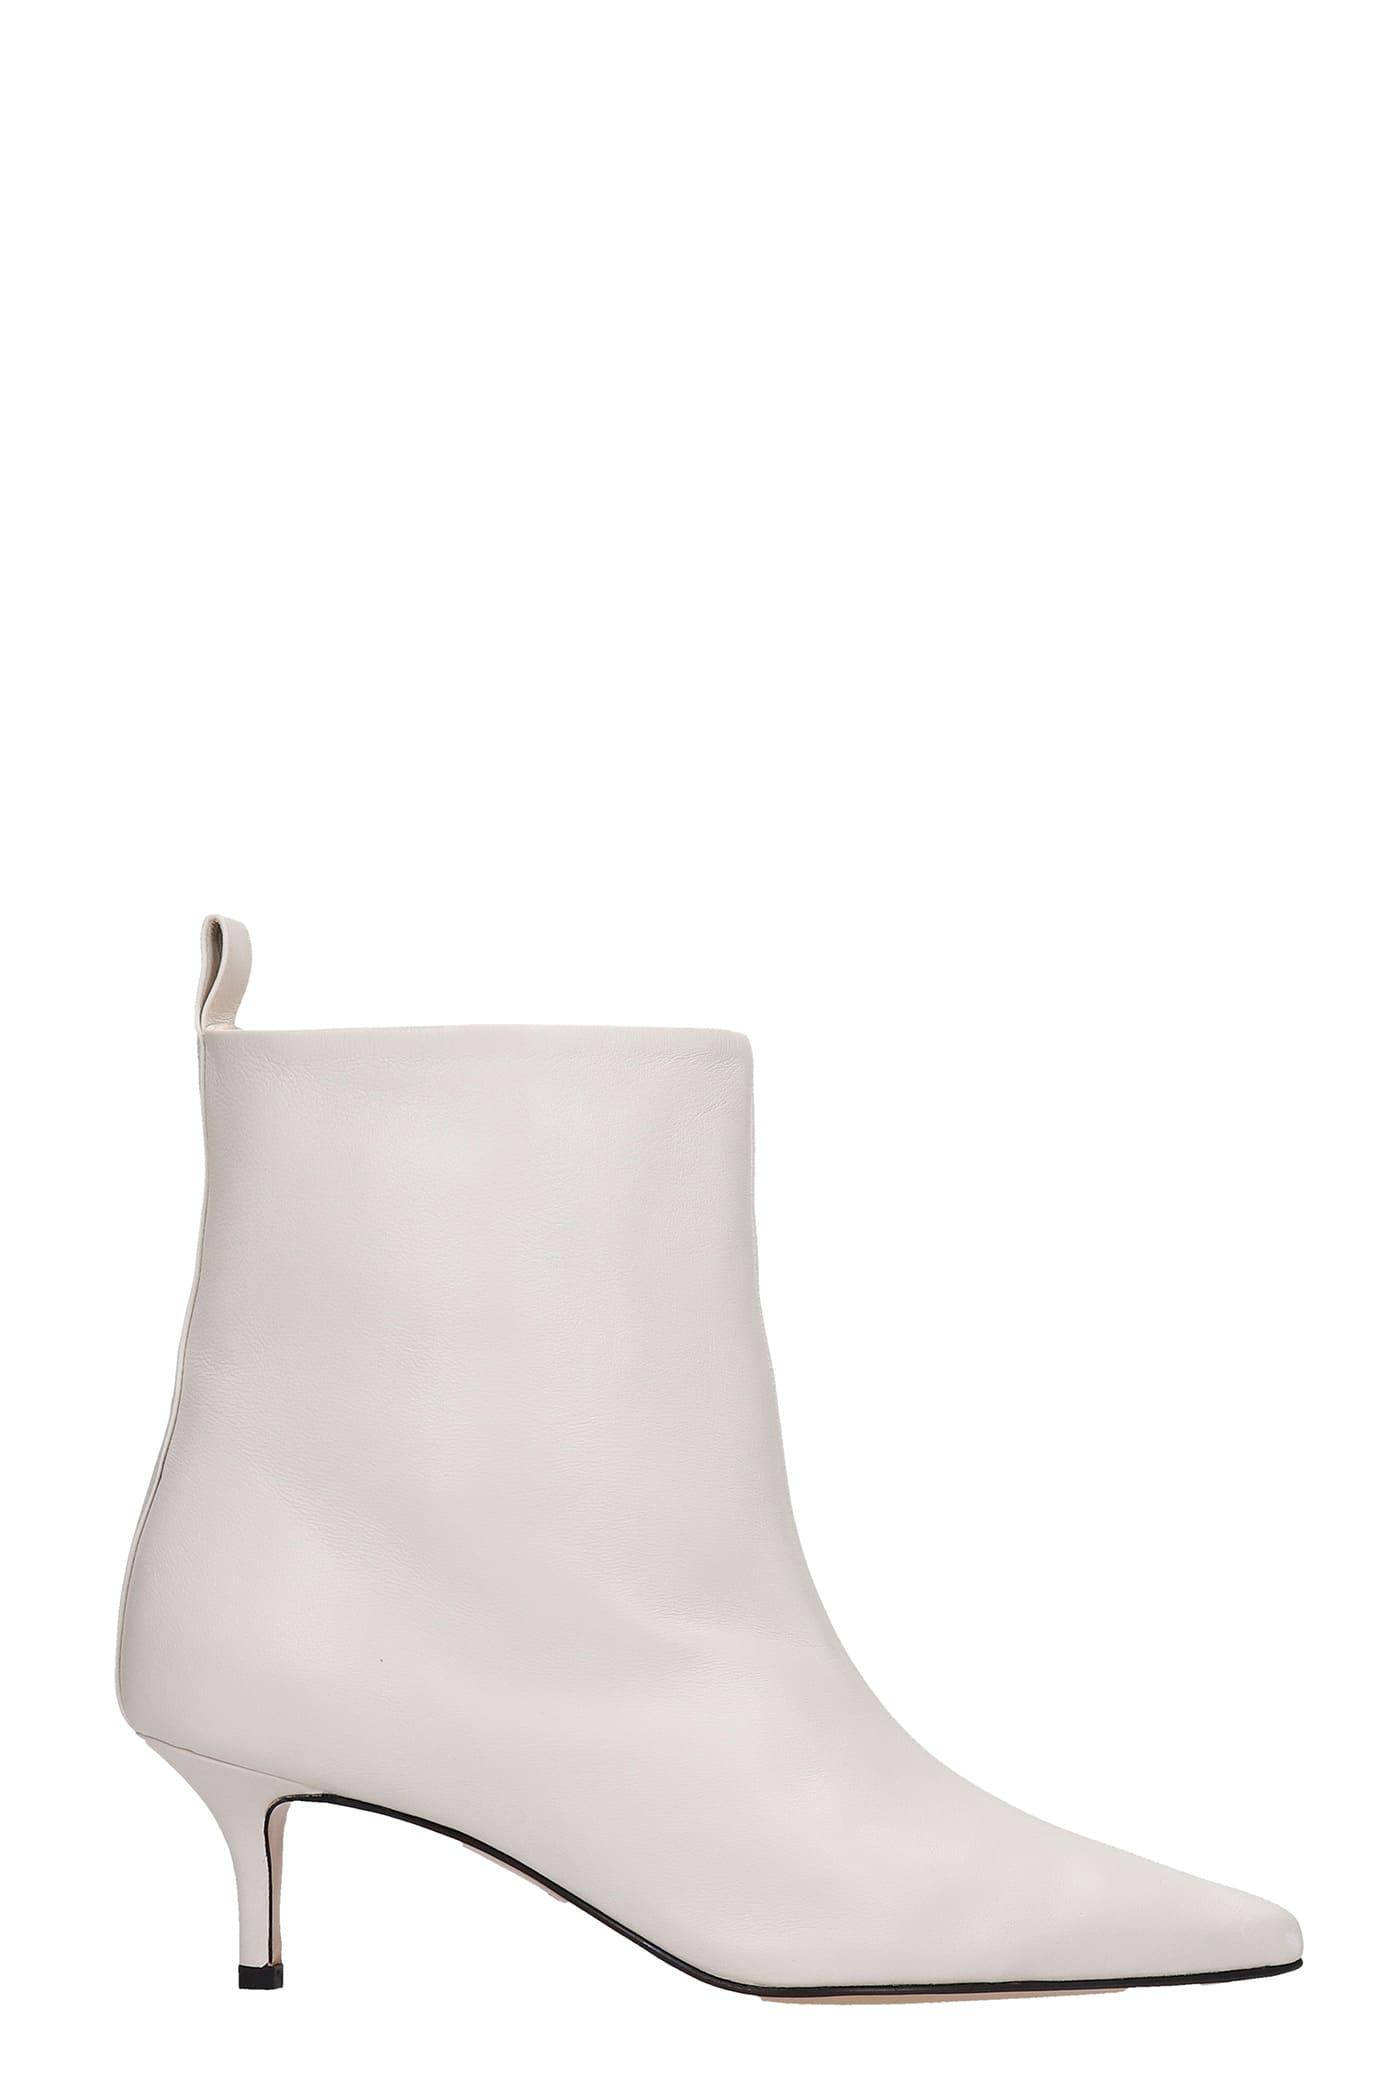 Bella Low Heels Ankle Boots In Beige Leather